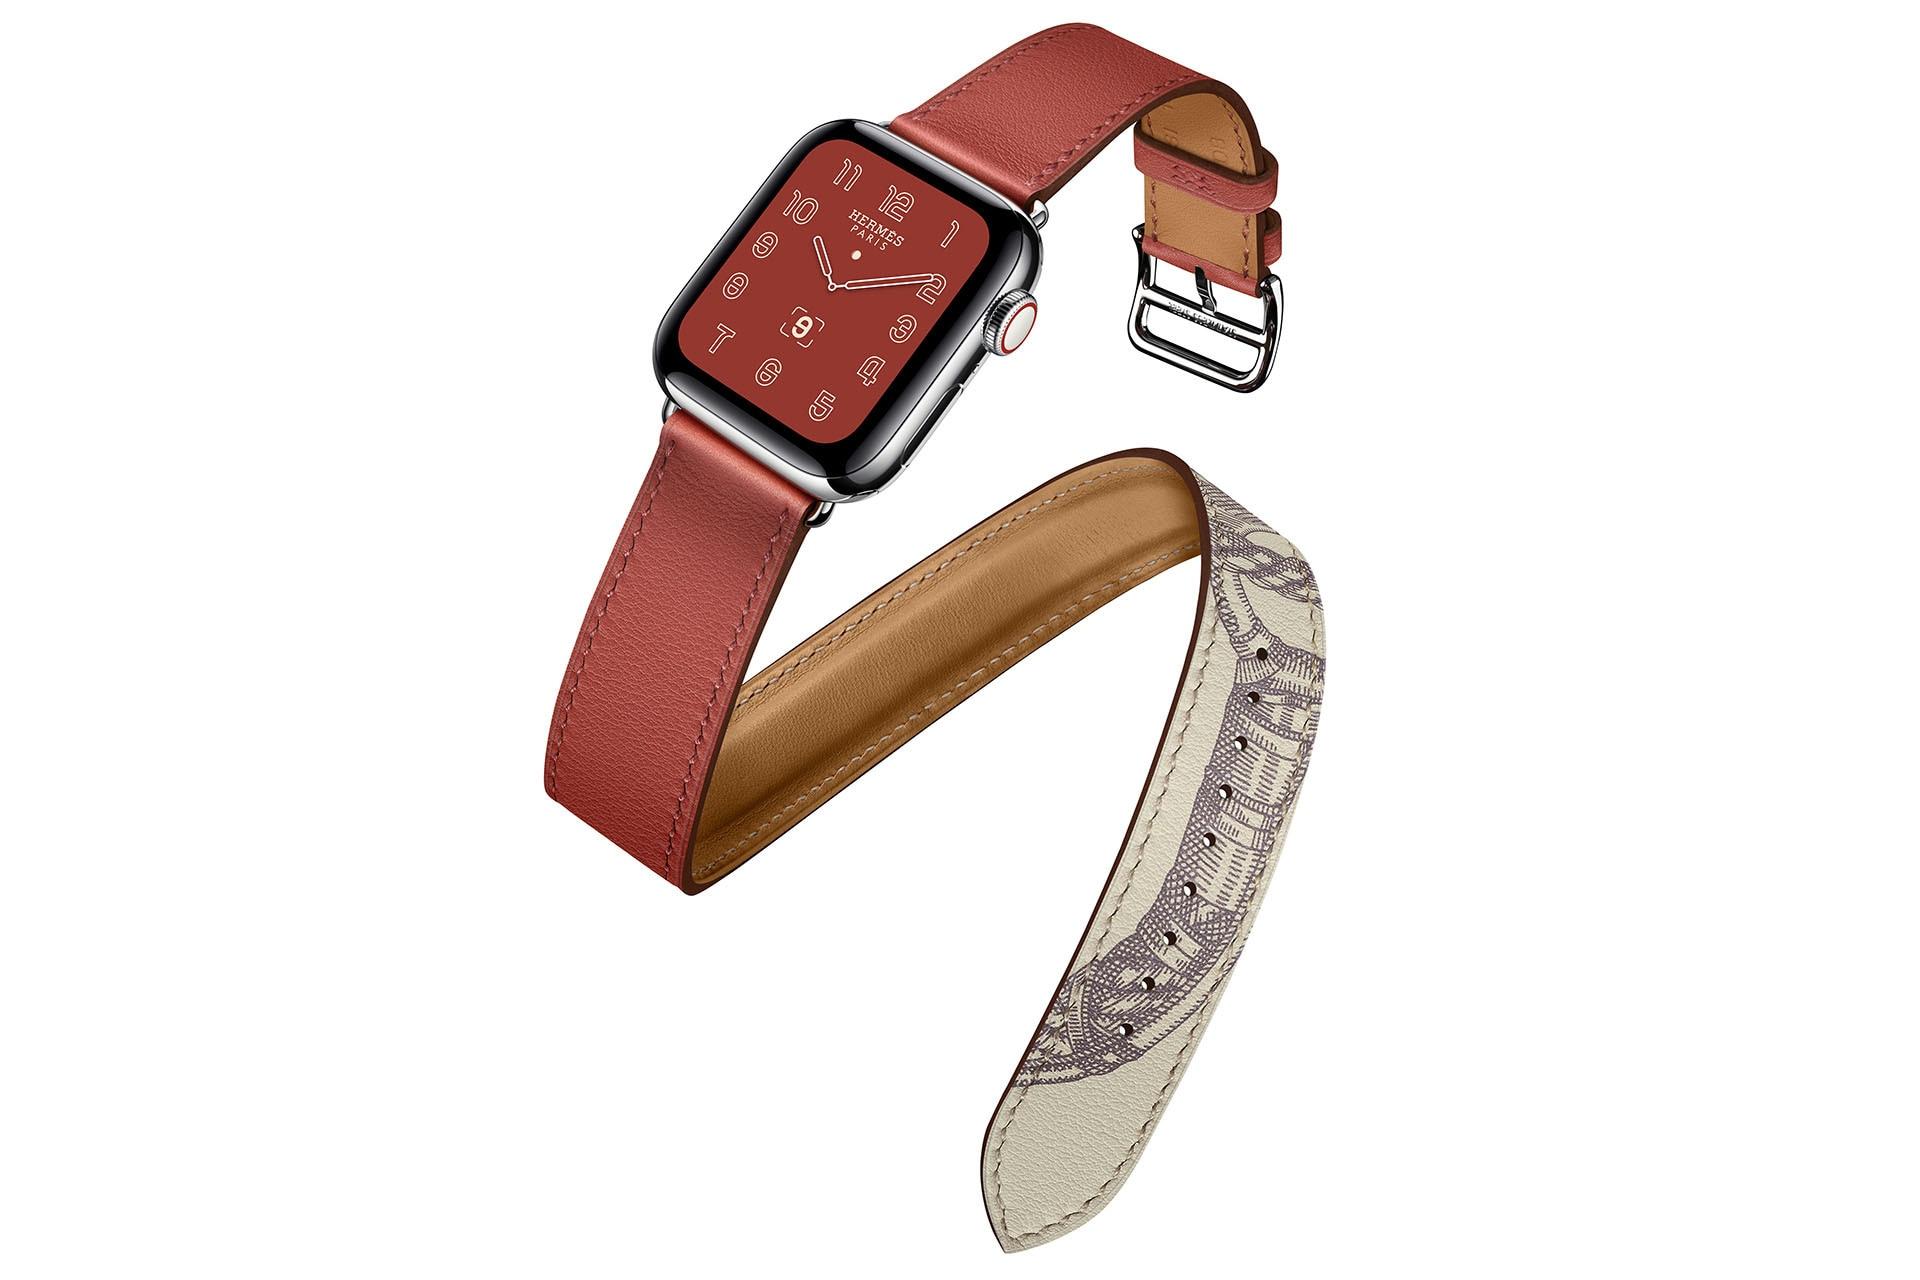 Apple Watch Hermès series 5. Image credit: supplied